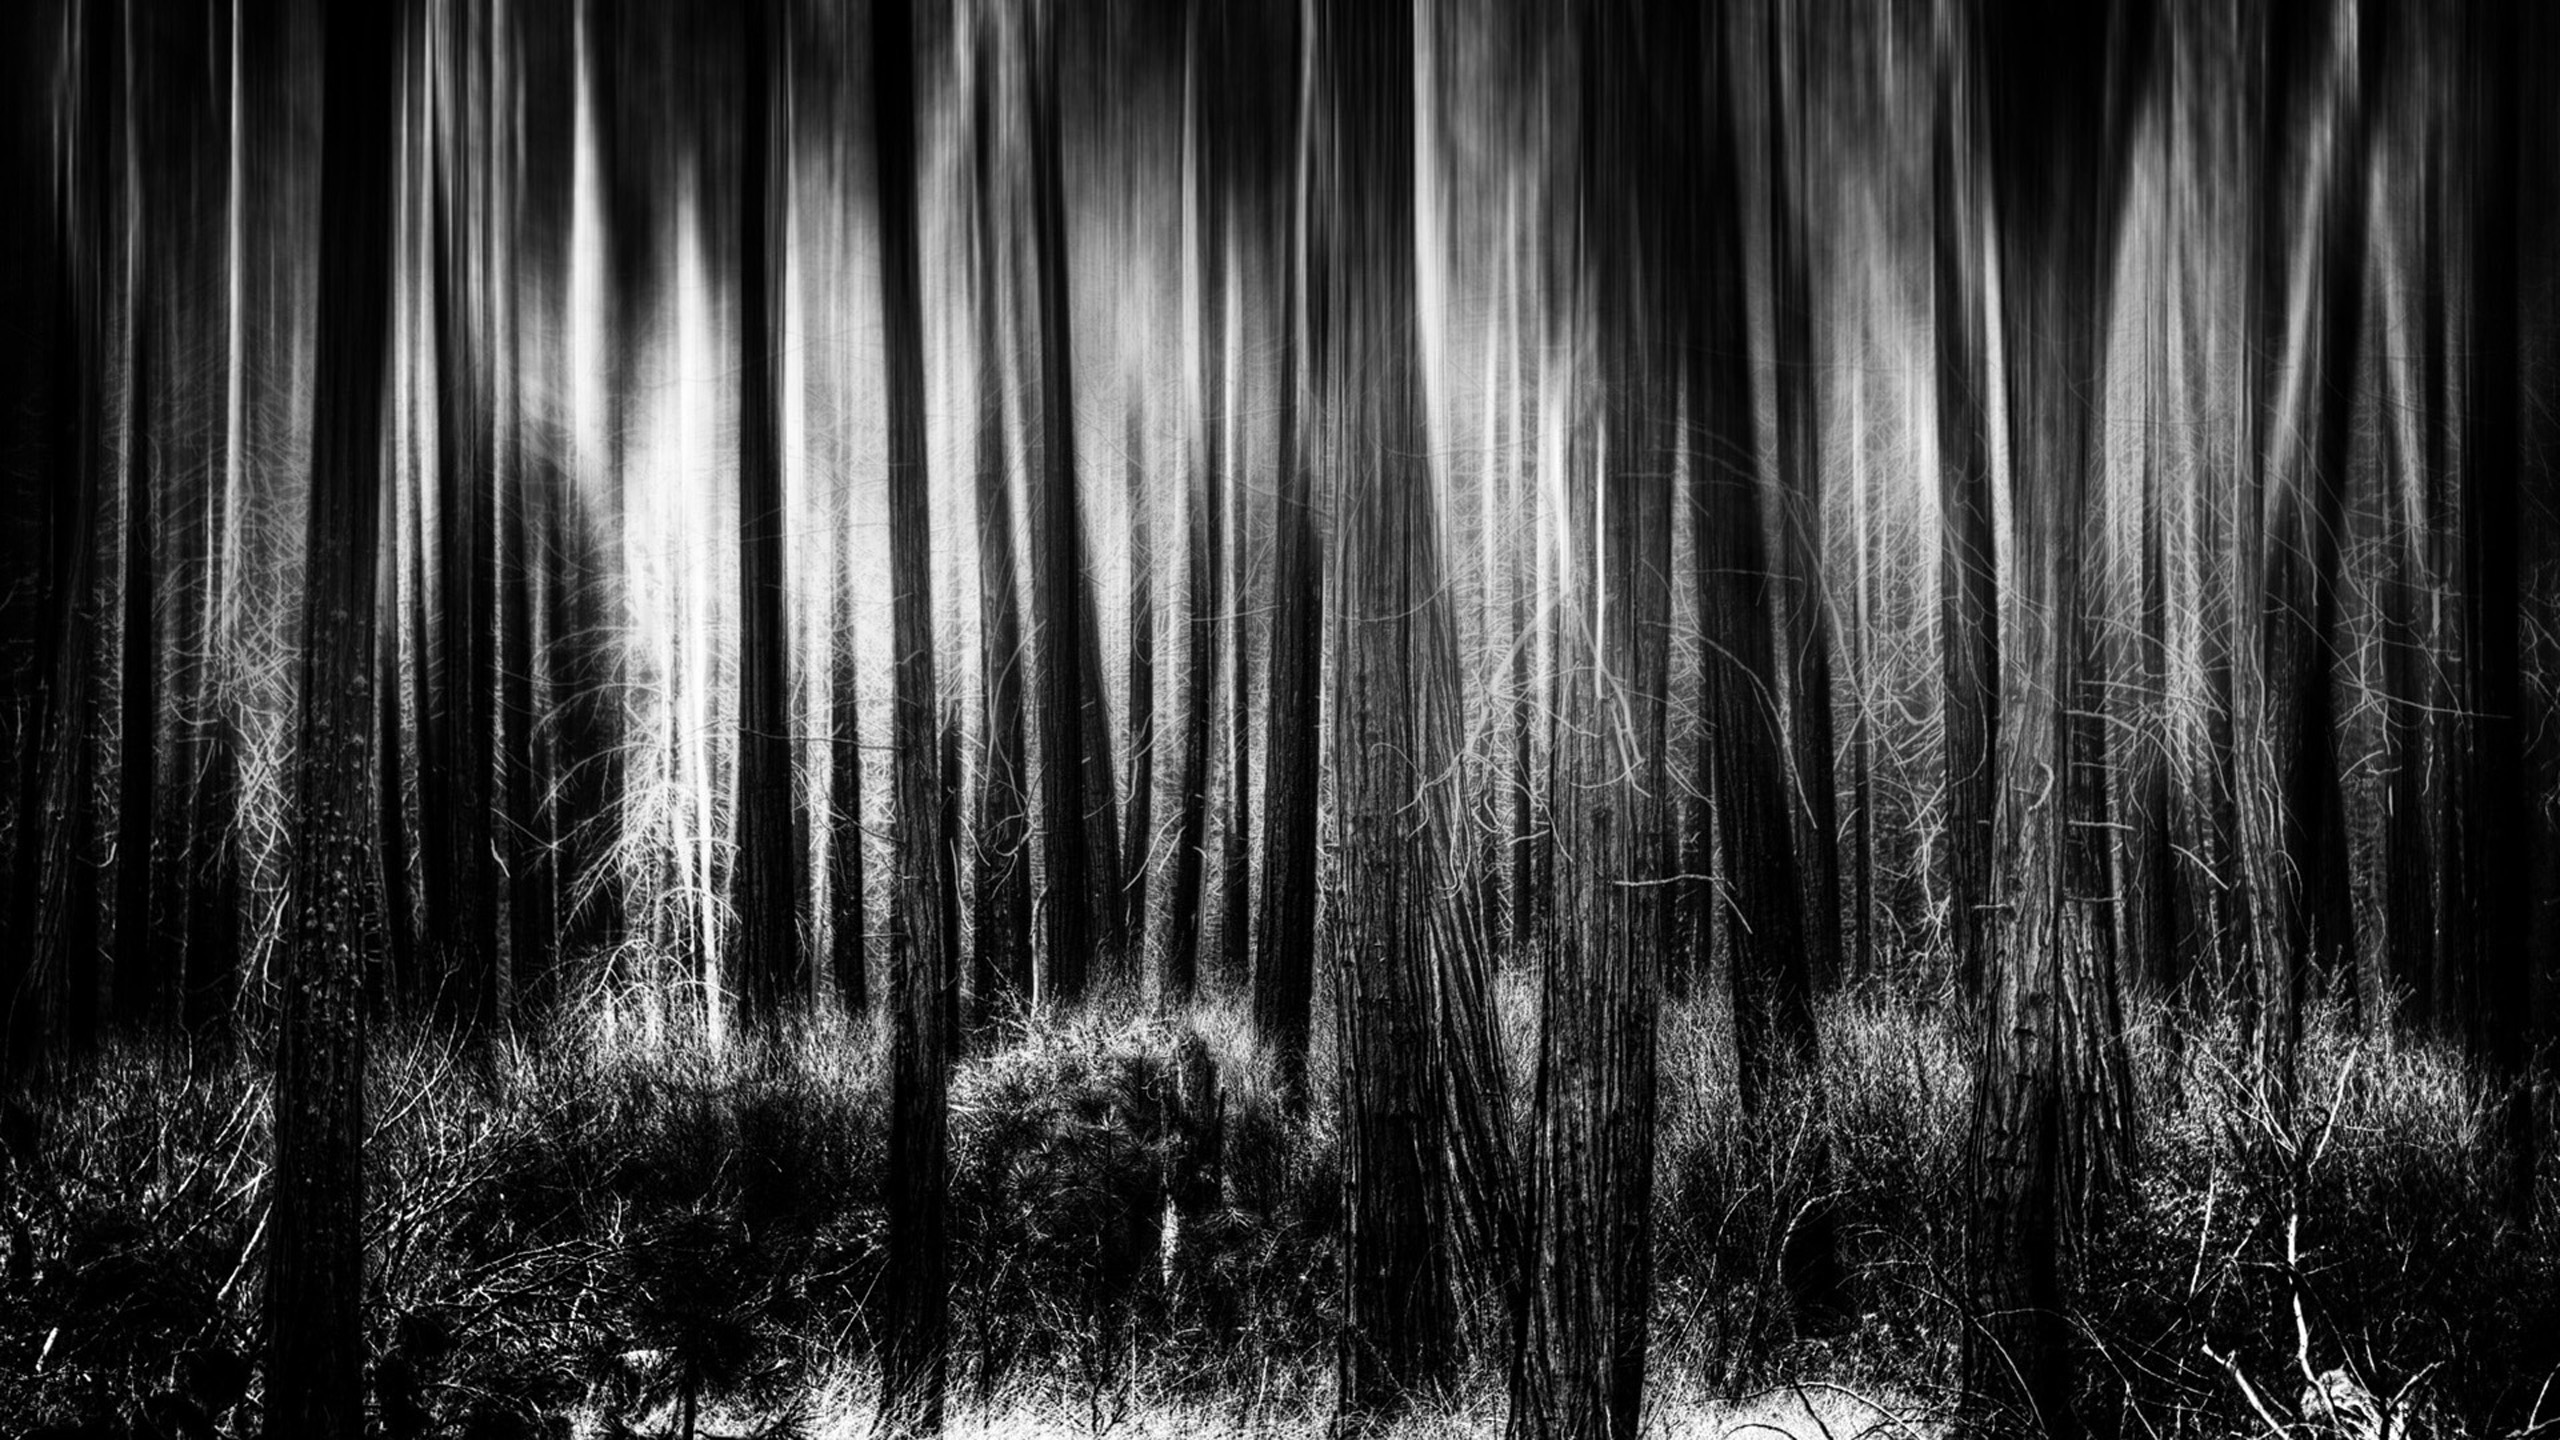 Cartoon Images Fall Wallpaper Black And White Forest Background For Desktop Pixelstalk Net